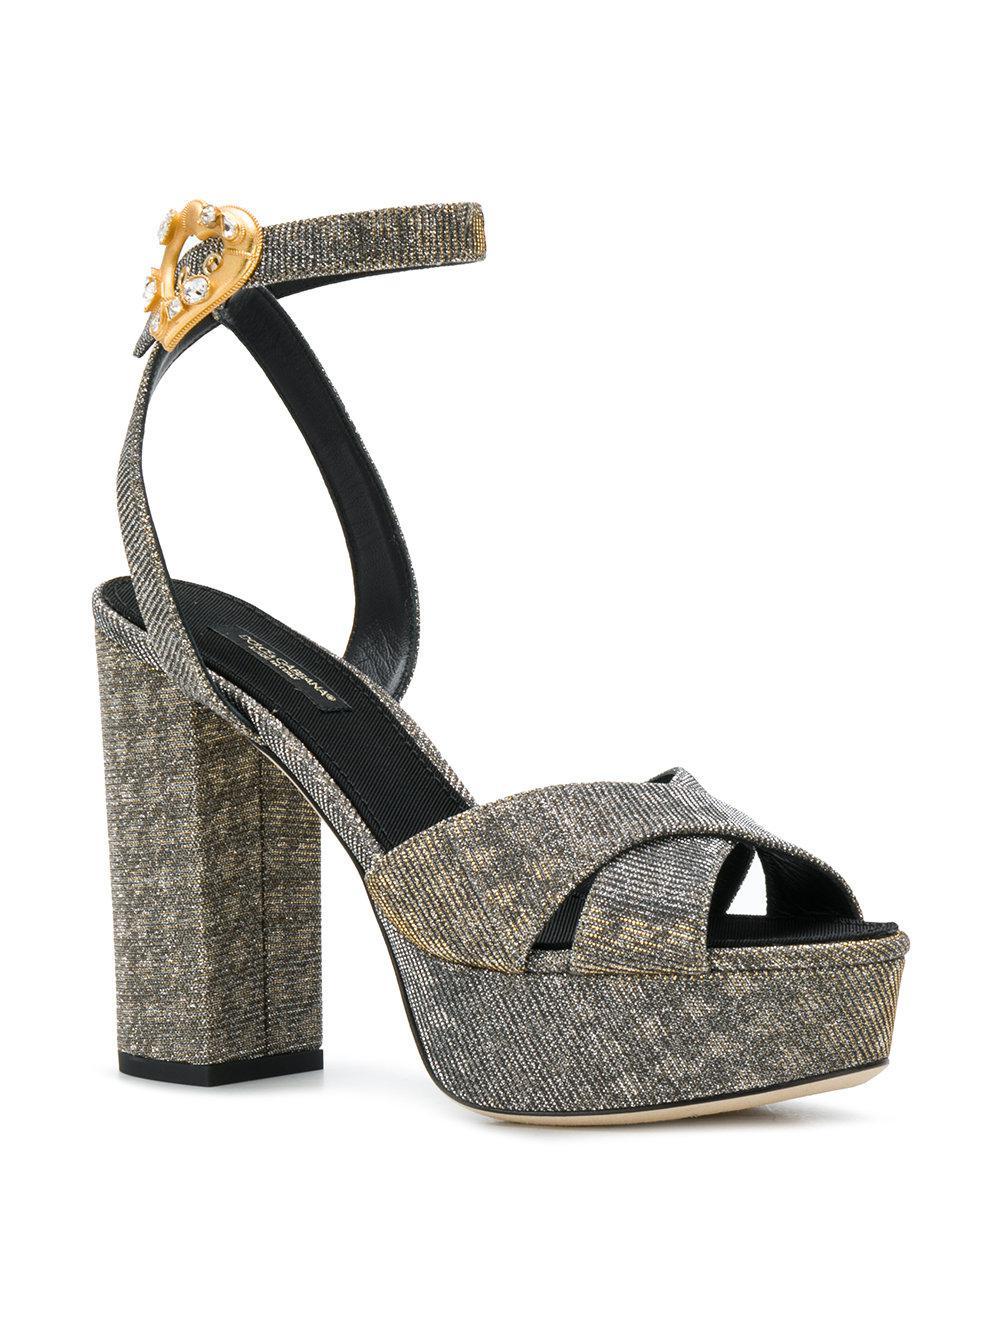 Discount Geniue Stockist platform ankle strap sandals - Metallic Dolce & Gabbana Hot Sale Cheap Online Free Shipping Best VhvfHl84k